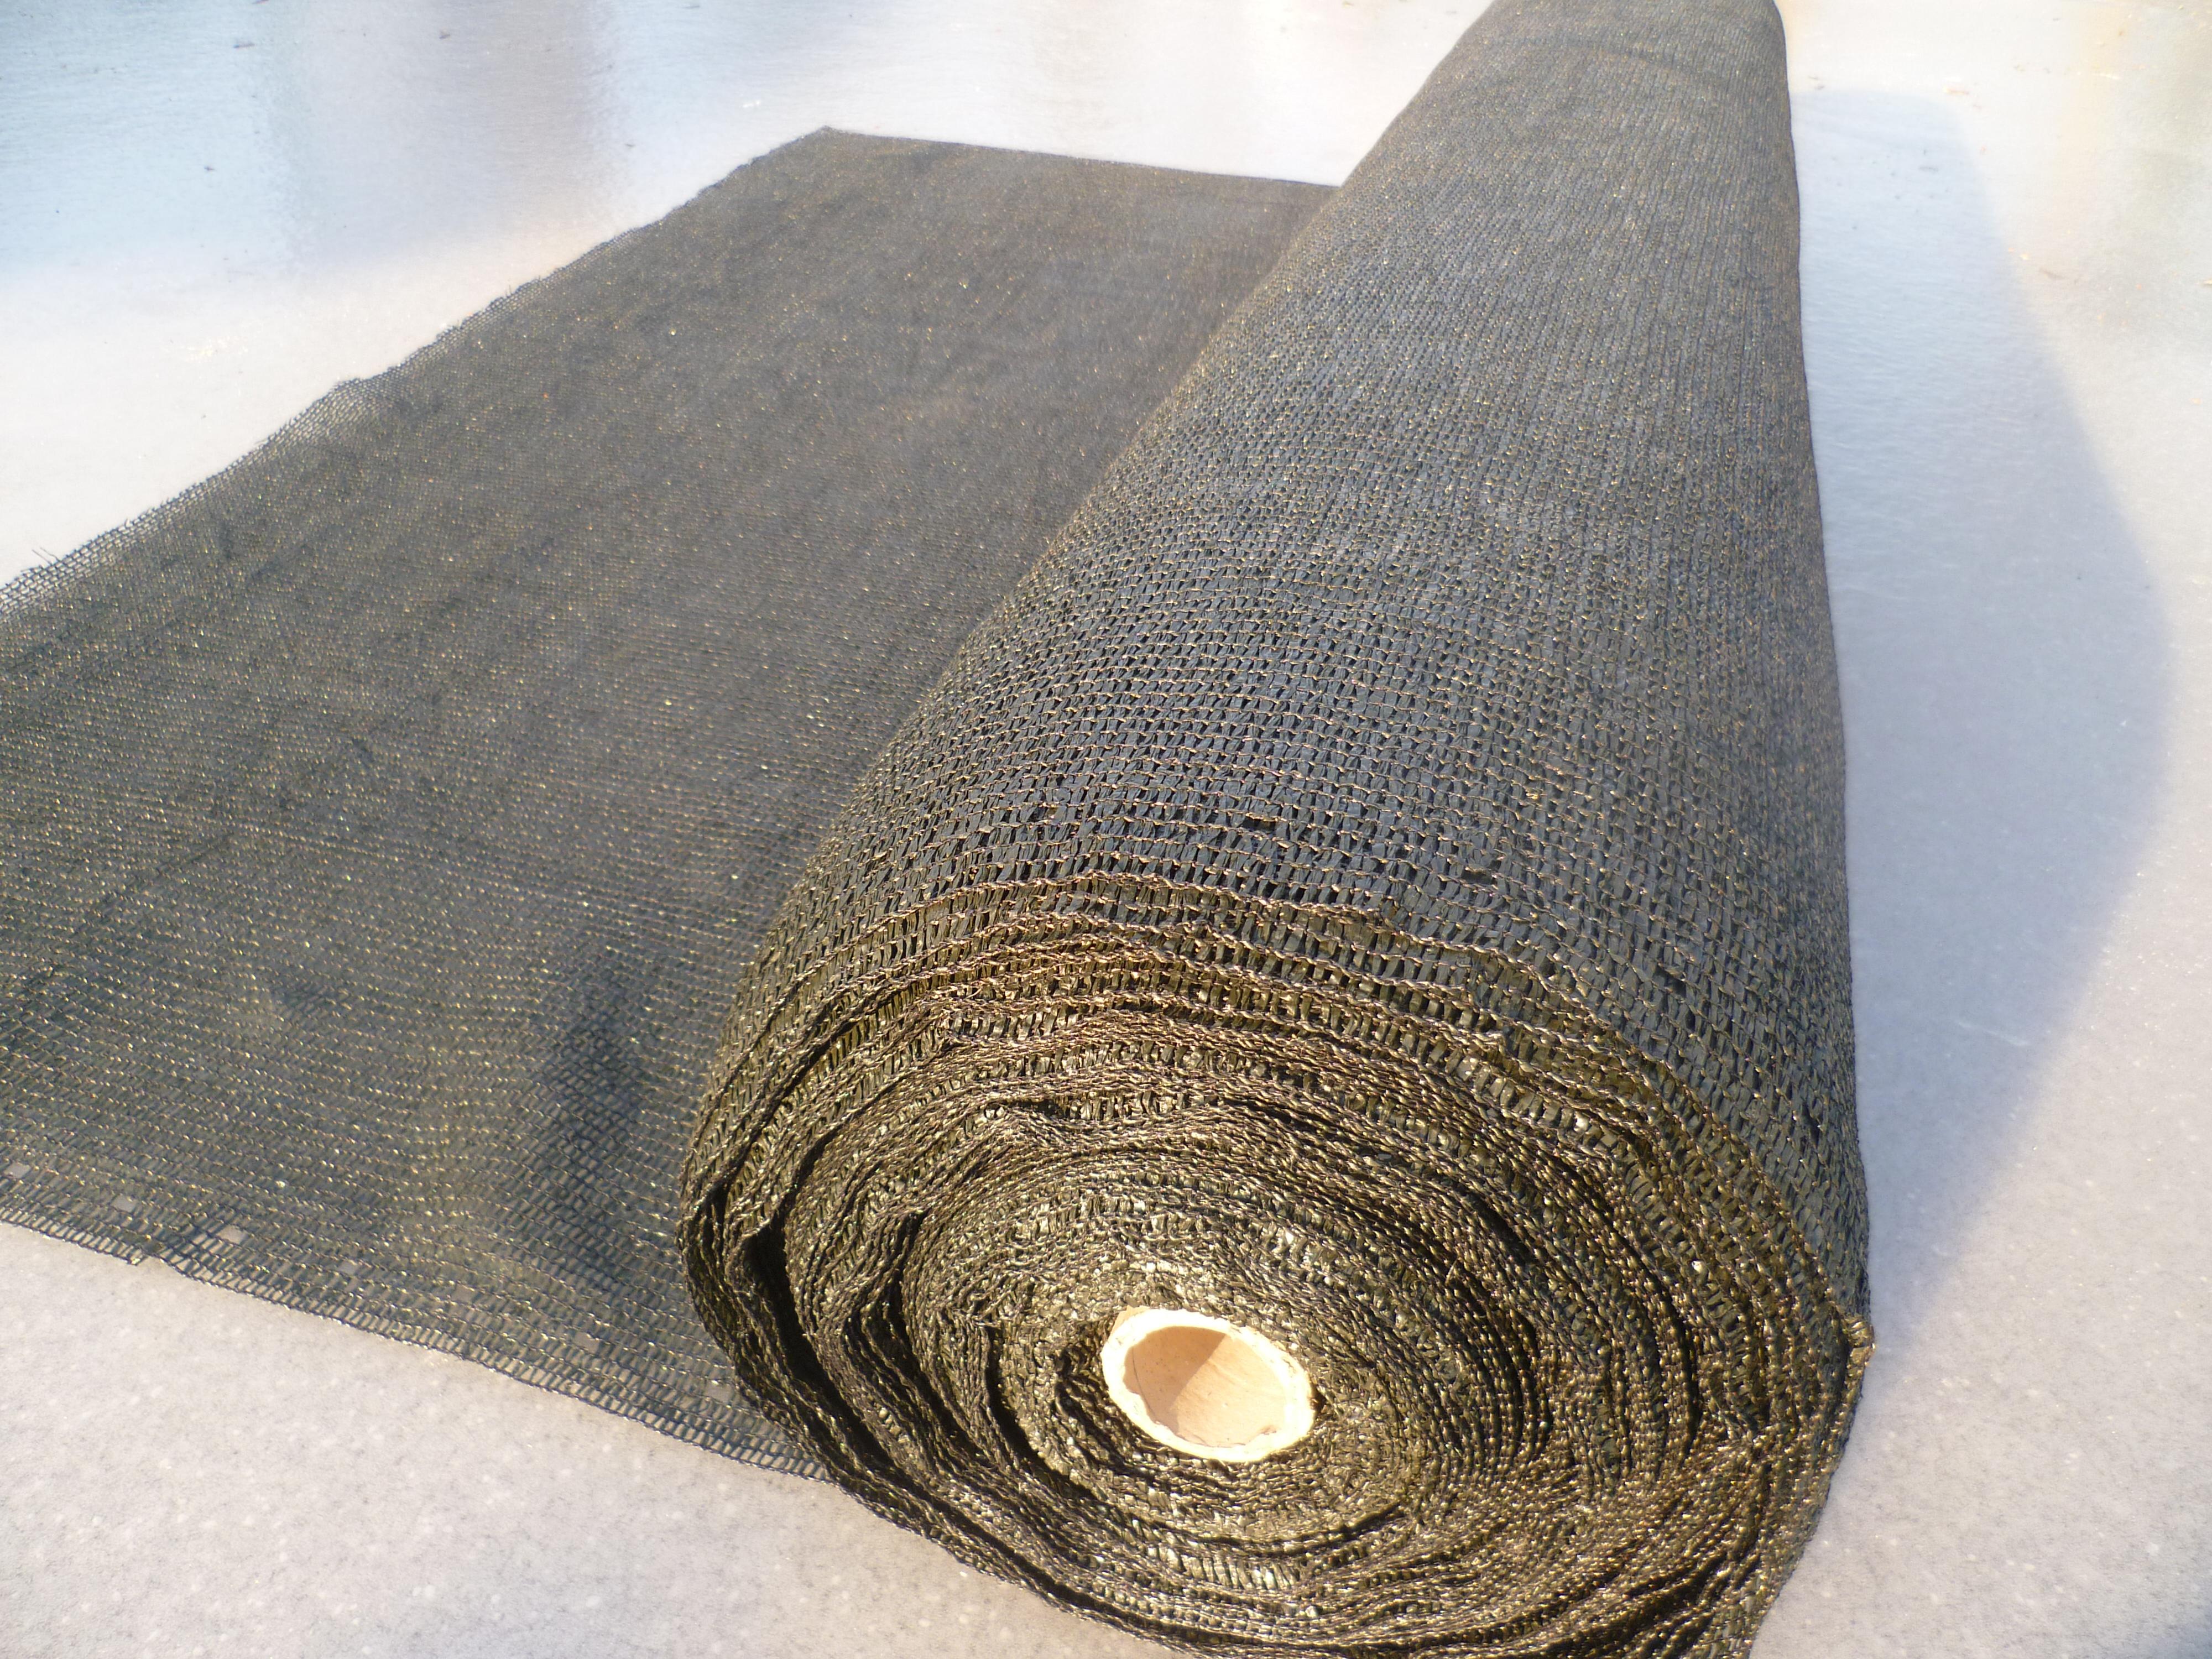 5m² maulwurfnetz maulwurfsperre maulwurfgitter 90g 2m breit | ebay